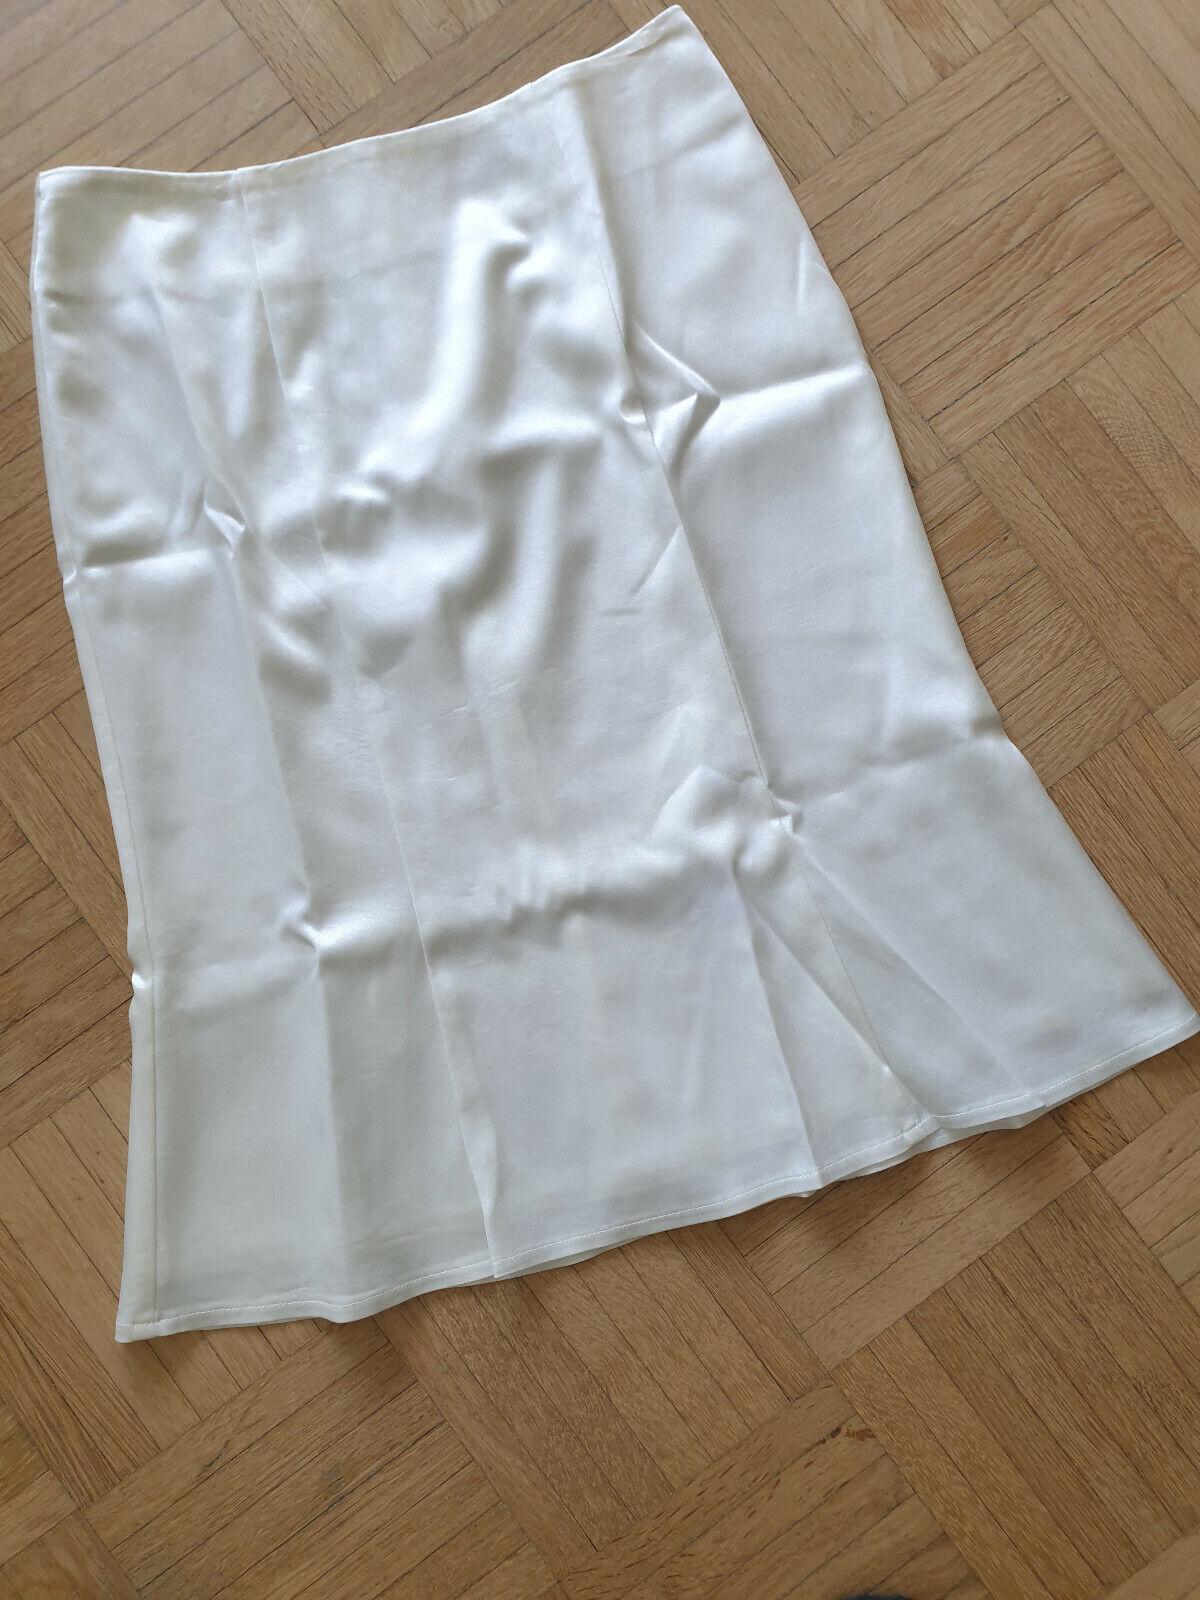 NEW Designer Nicowa Luxury Skirt White Satin Business Festive Size 34 XS